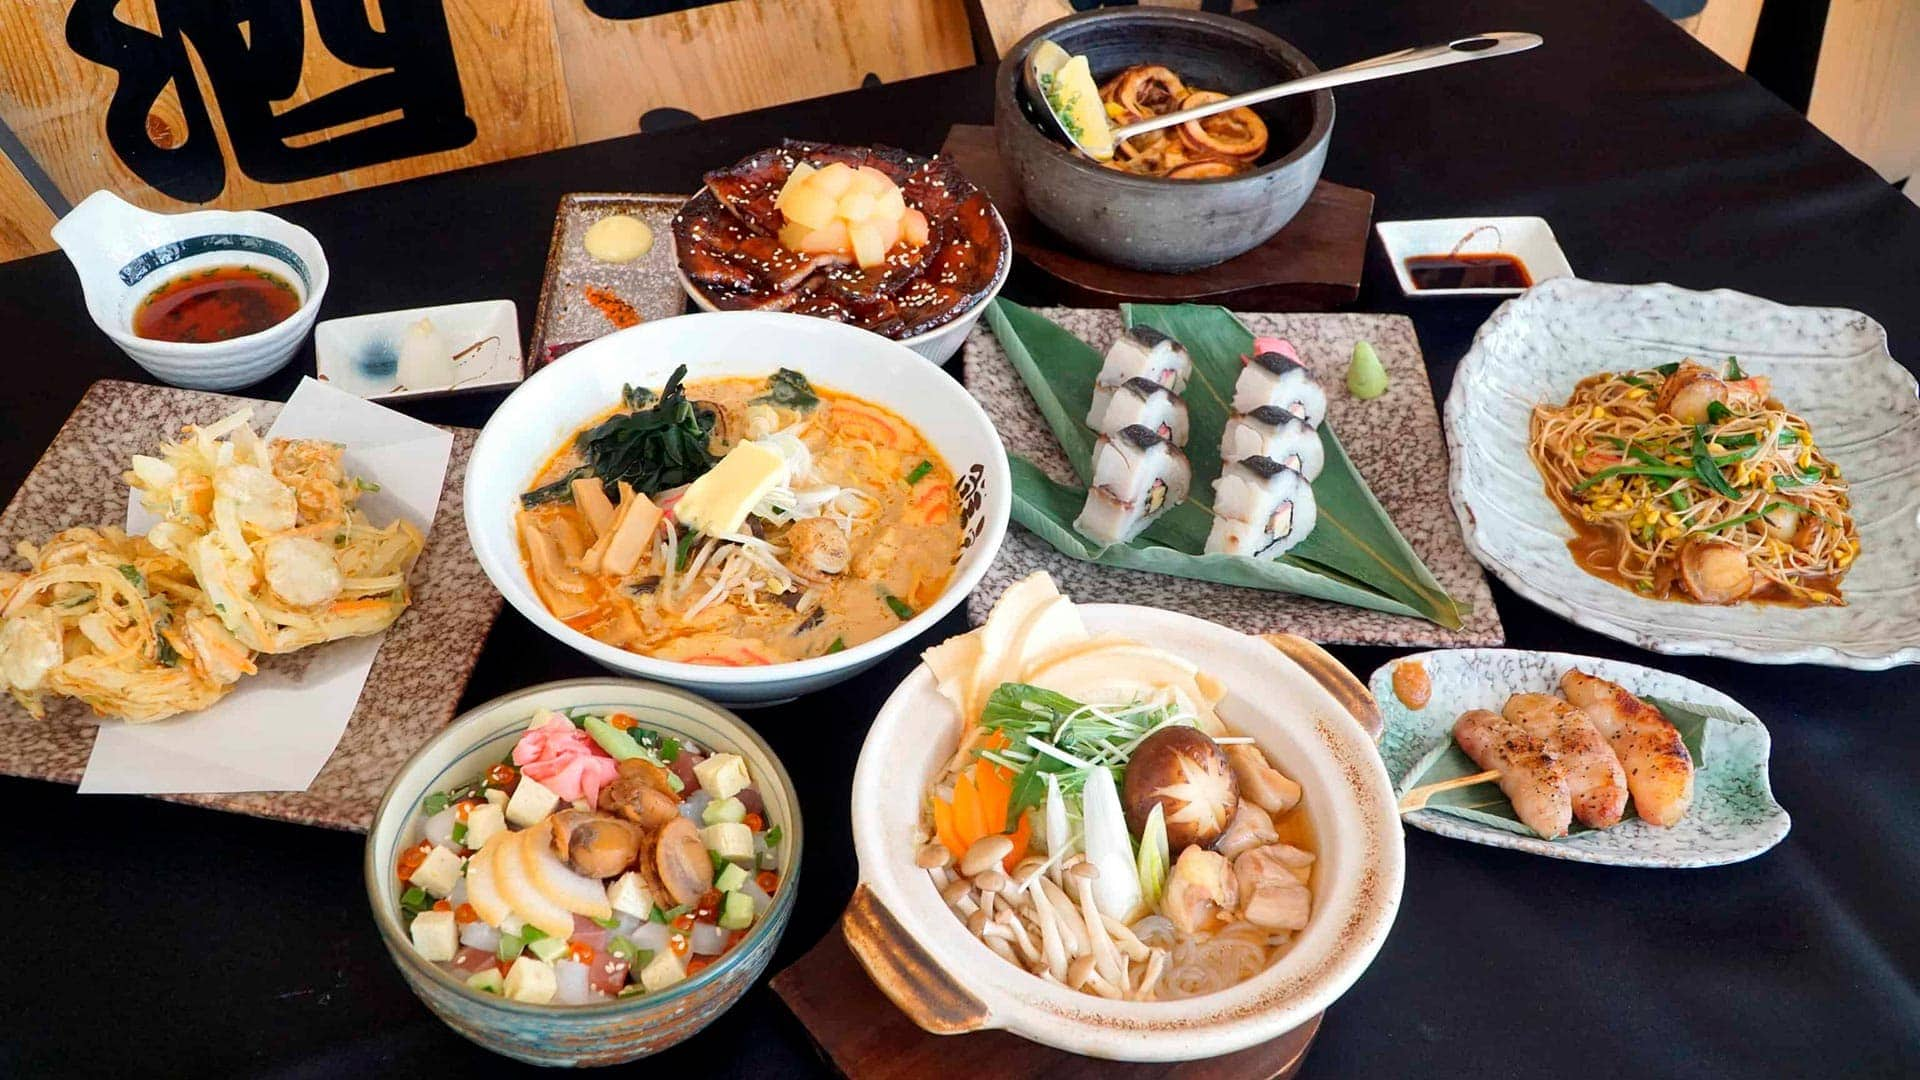 cokoguri - innovative digital nomads - aomori famous foods